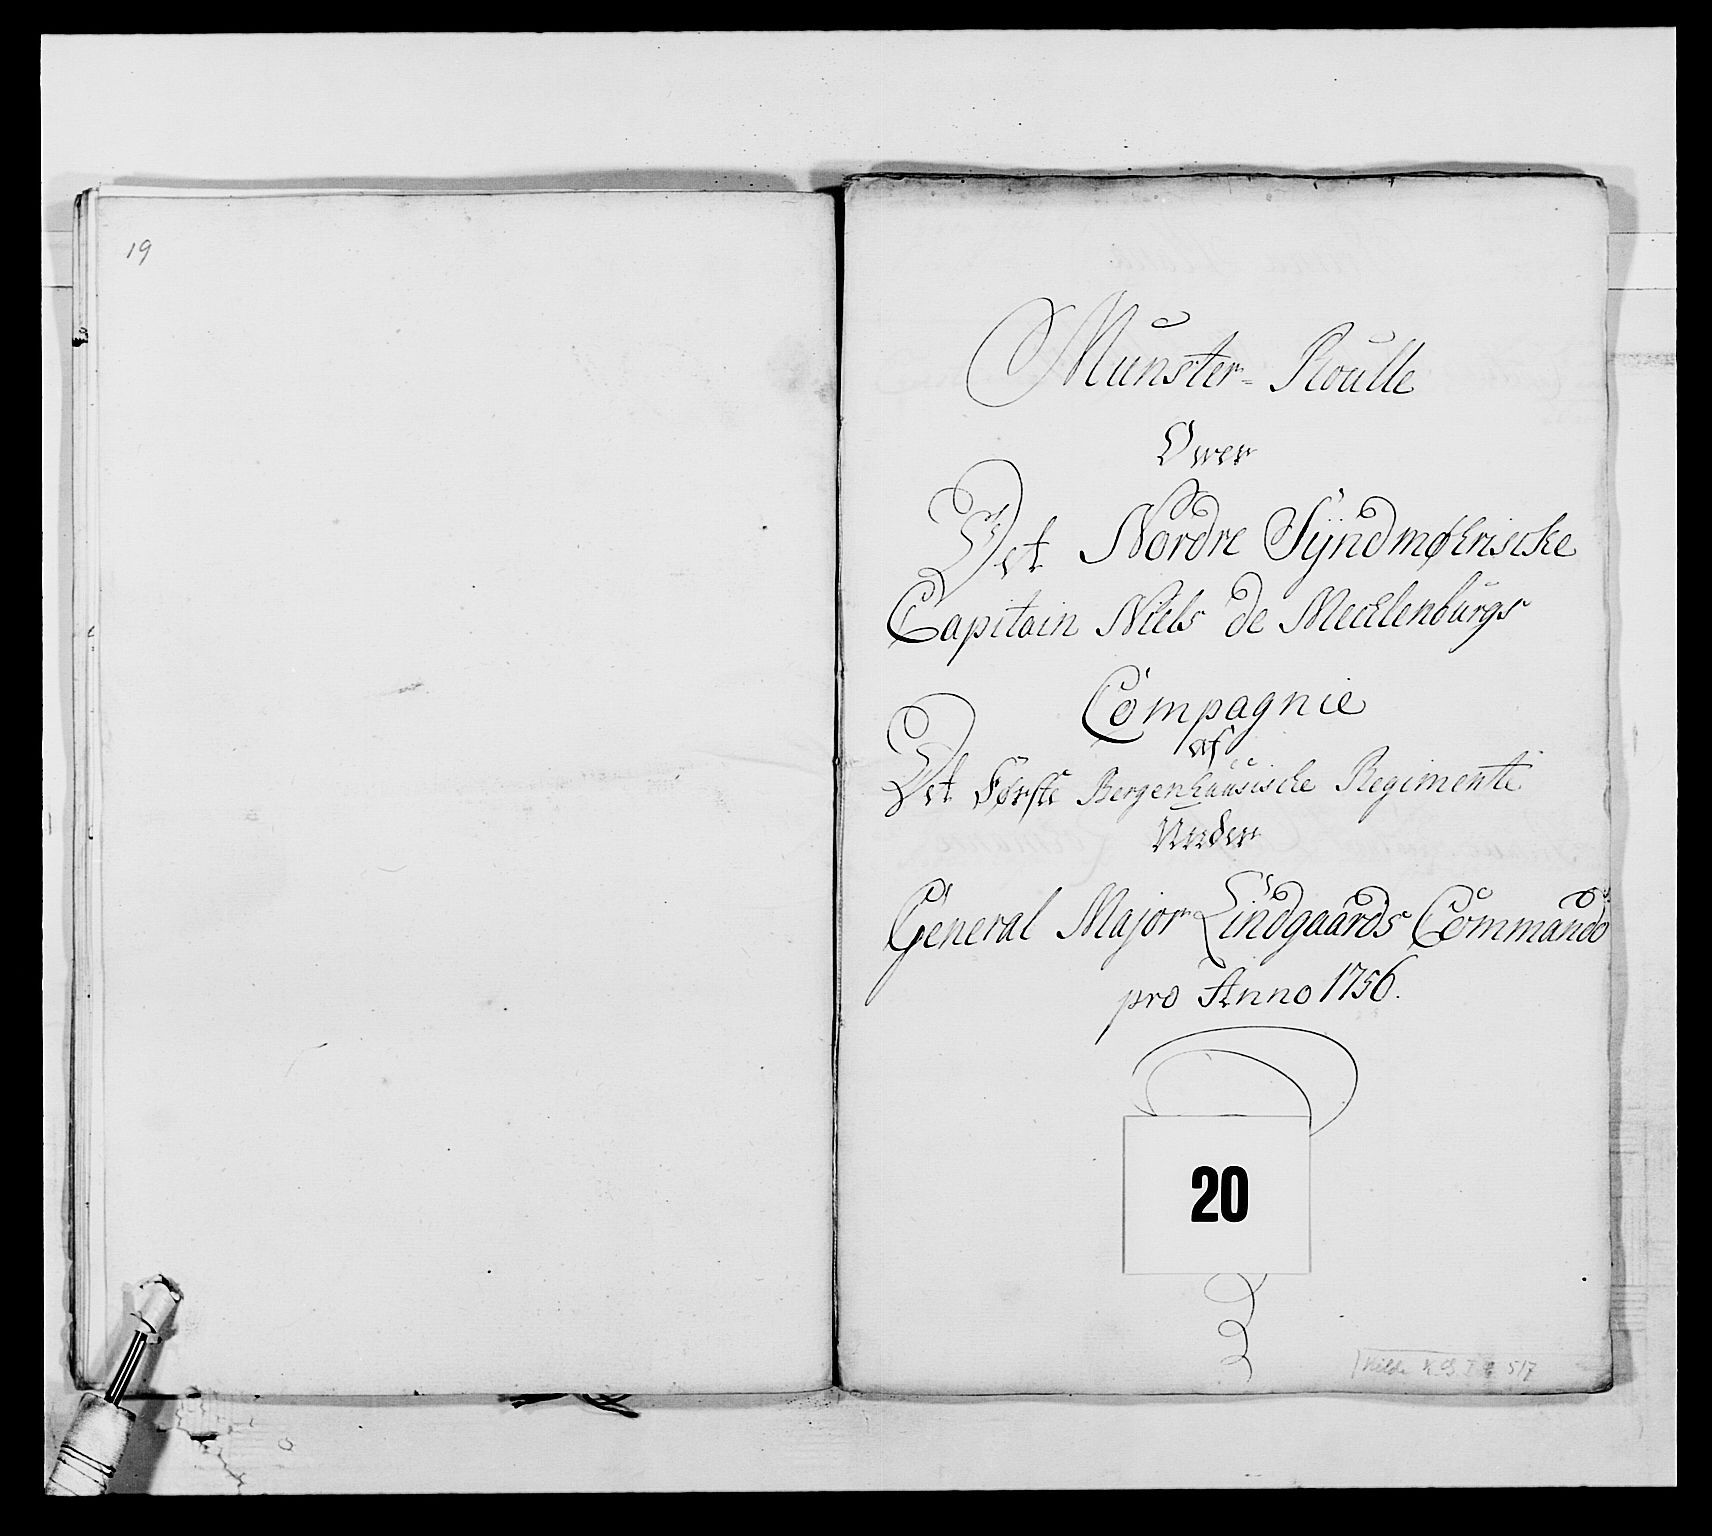 RA, Kommanderende general (KG I) med Det norske krigsdirektorium, E/Ea/L0517: 1. Bergenhusiske regiment, 1742-1756, s. 240